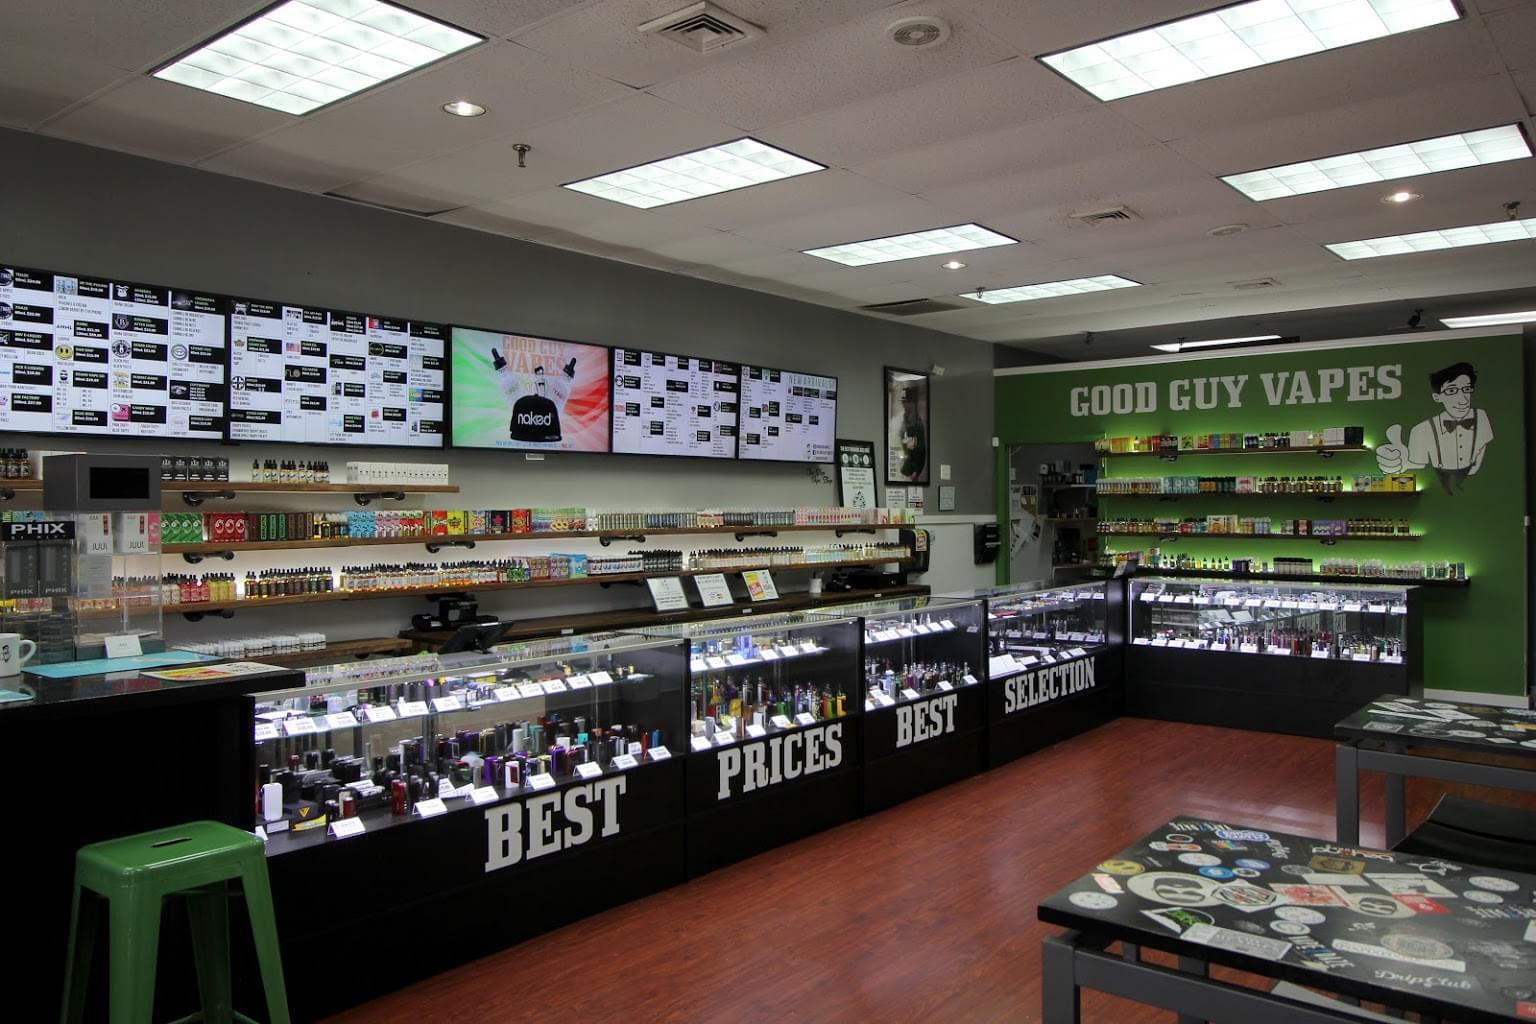 Good Guy Vapes – Parsippany, NJ – See-Inside Vaporizer Store